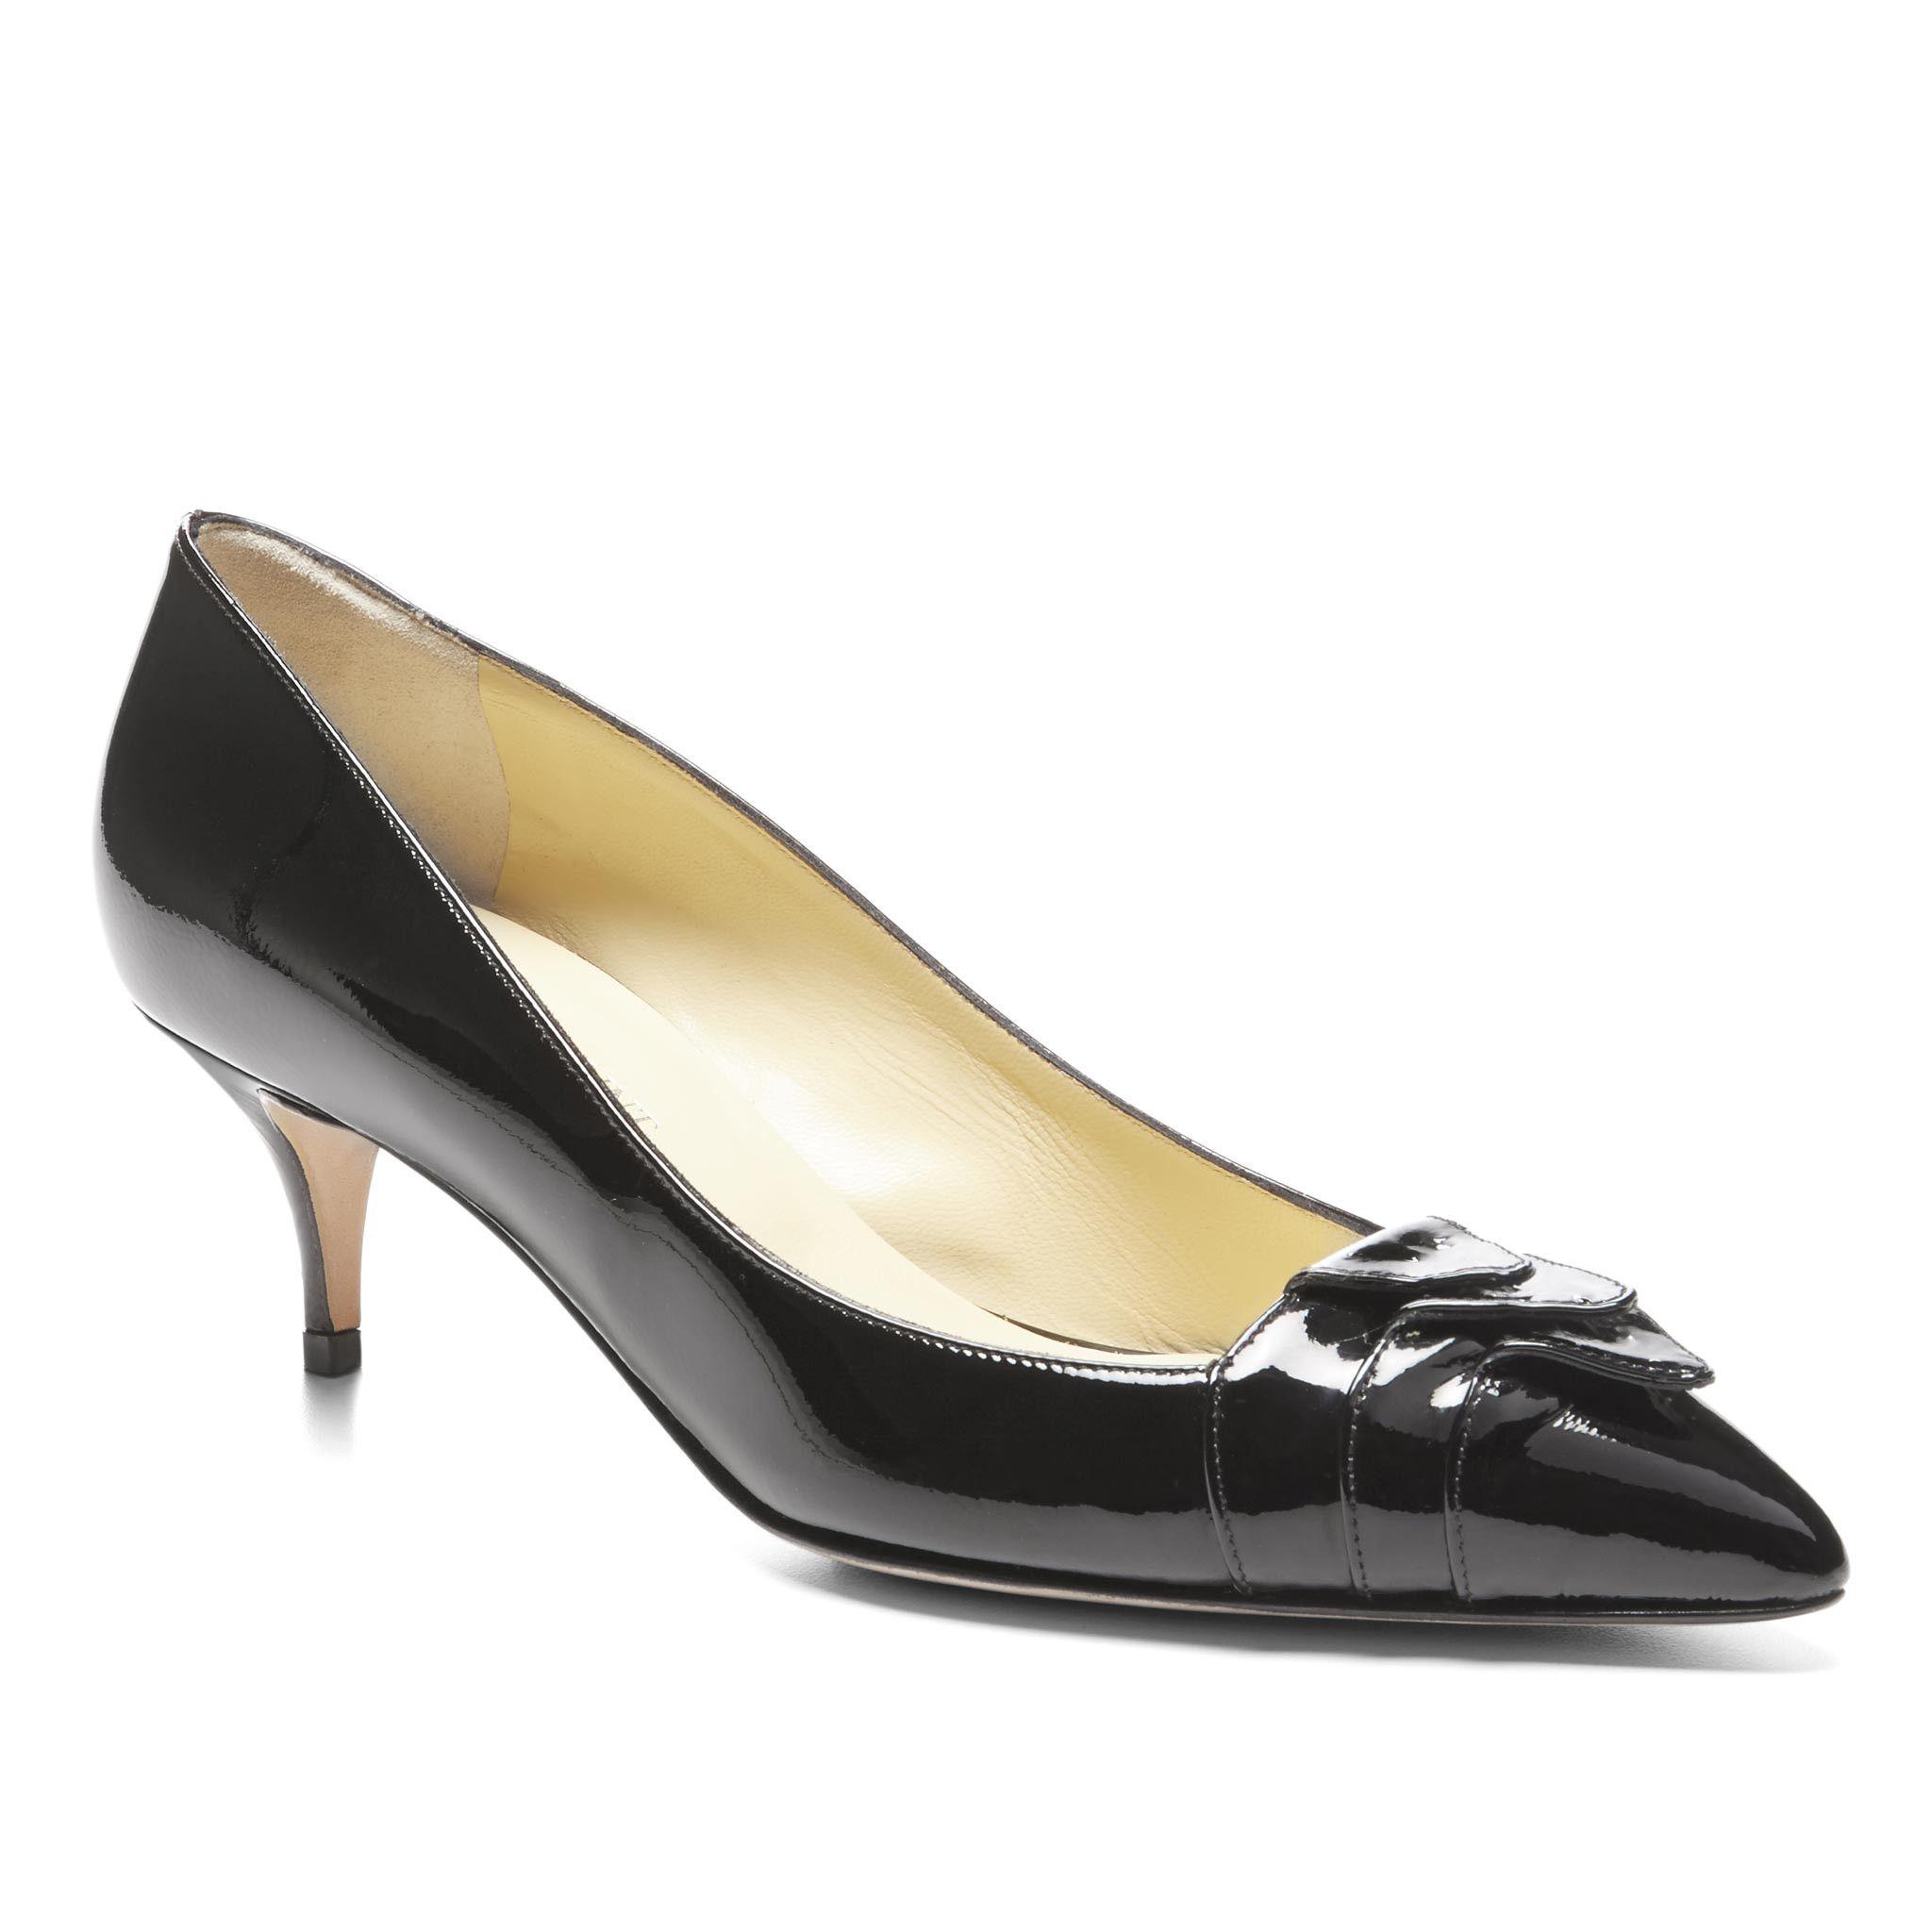 Carlotta in Black Patent Shoes, Kitten heels, Black patent